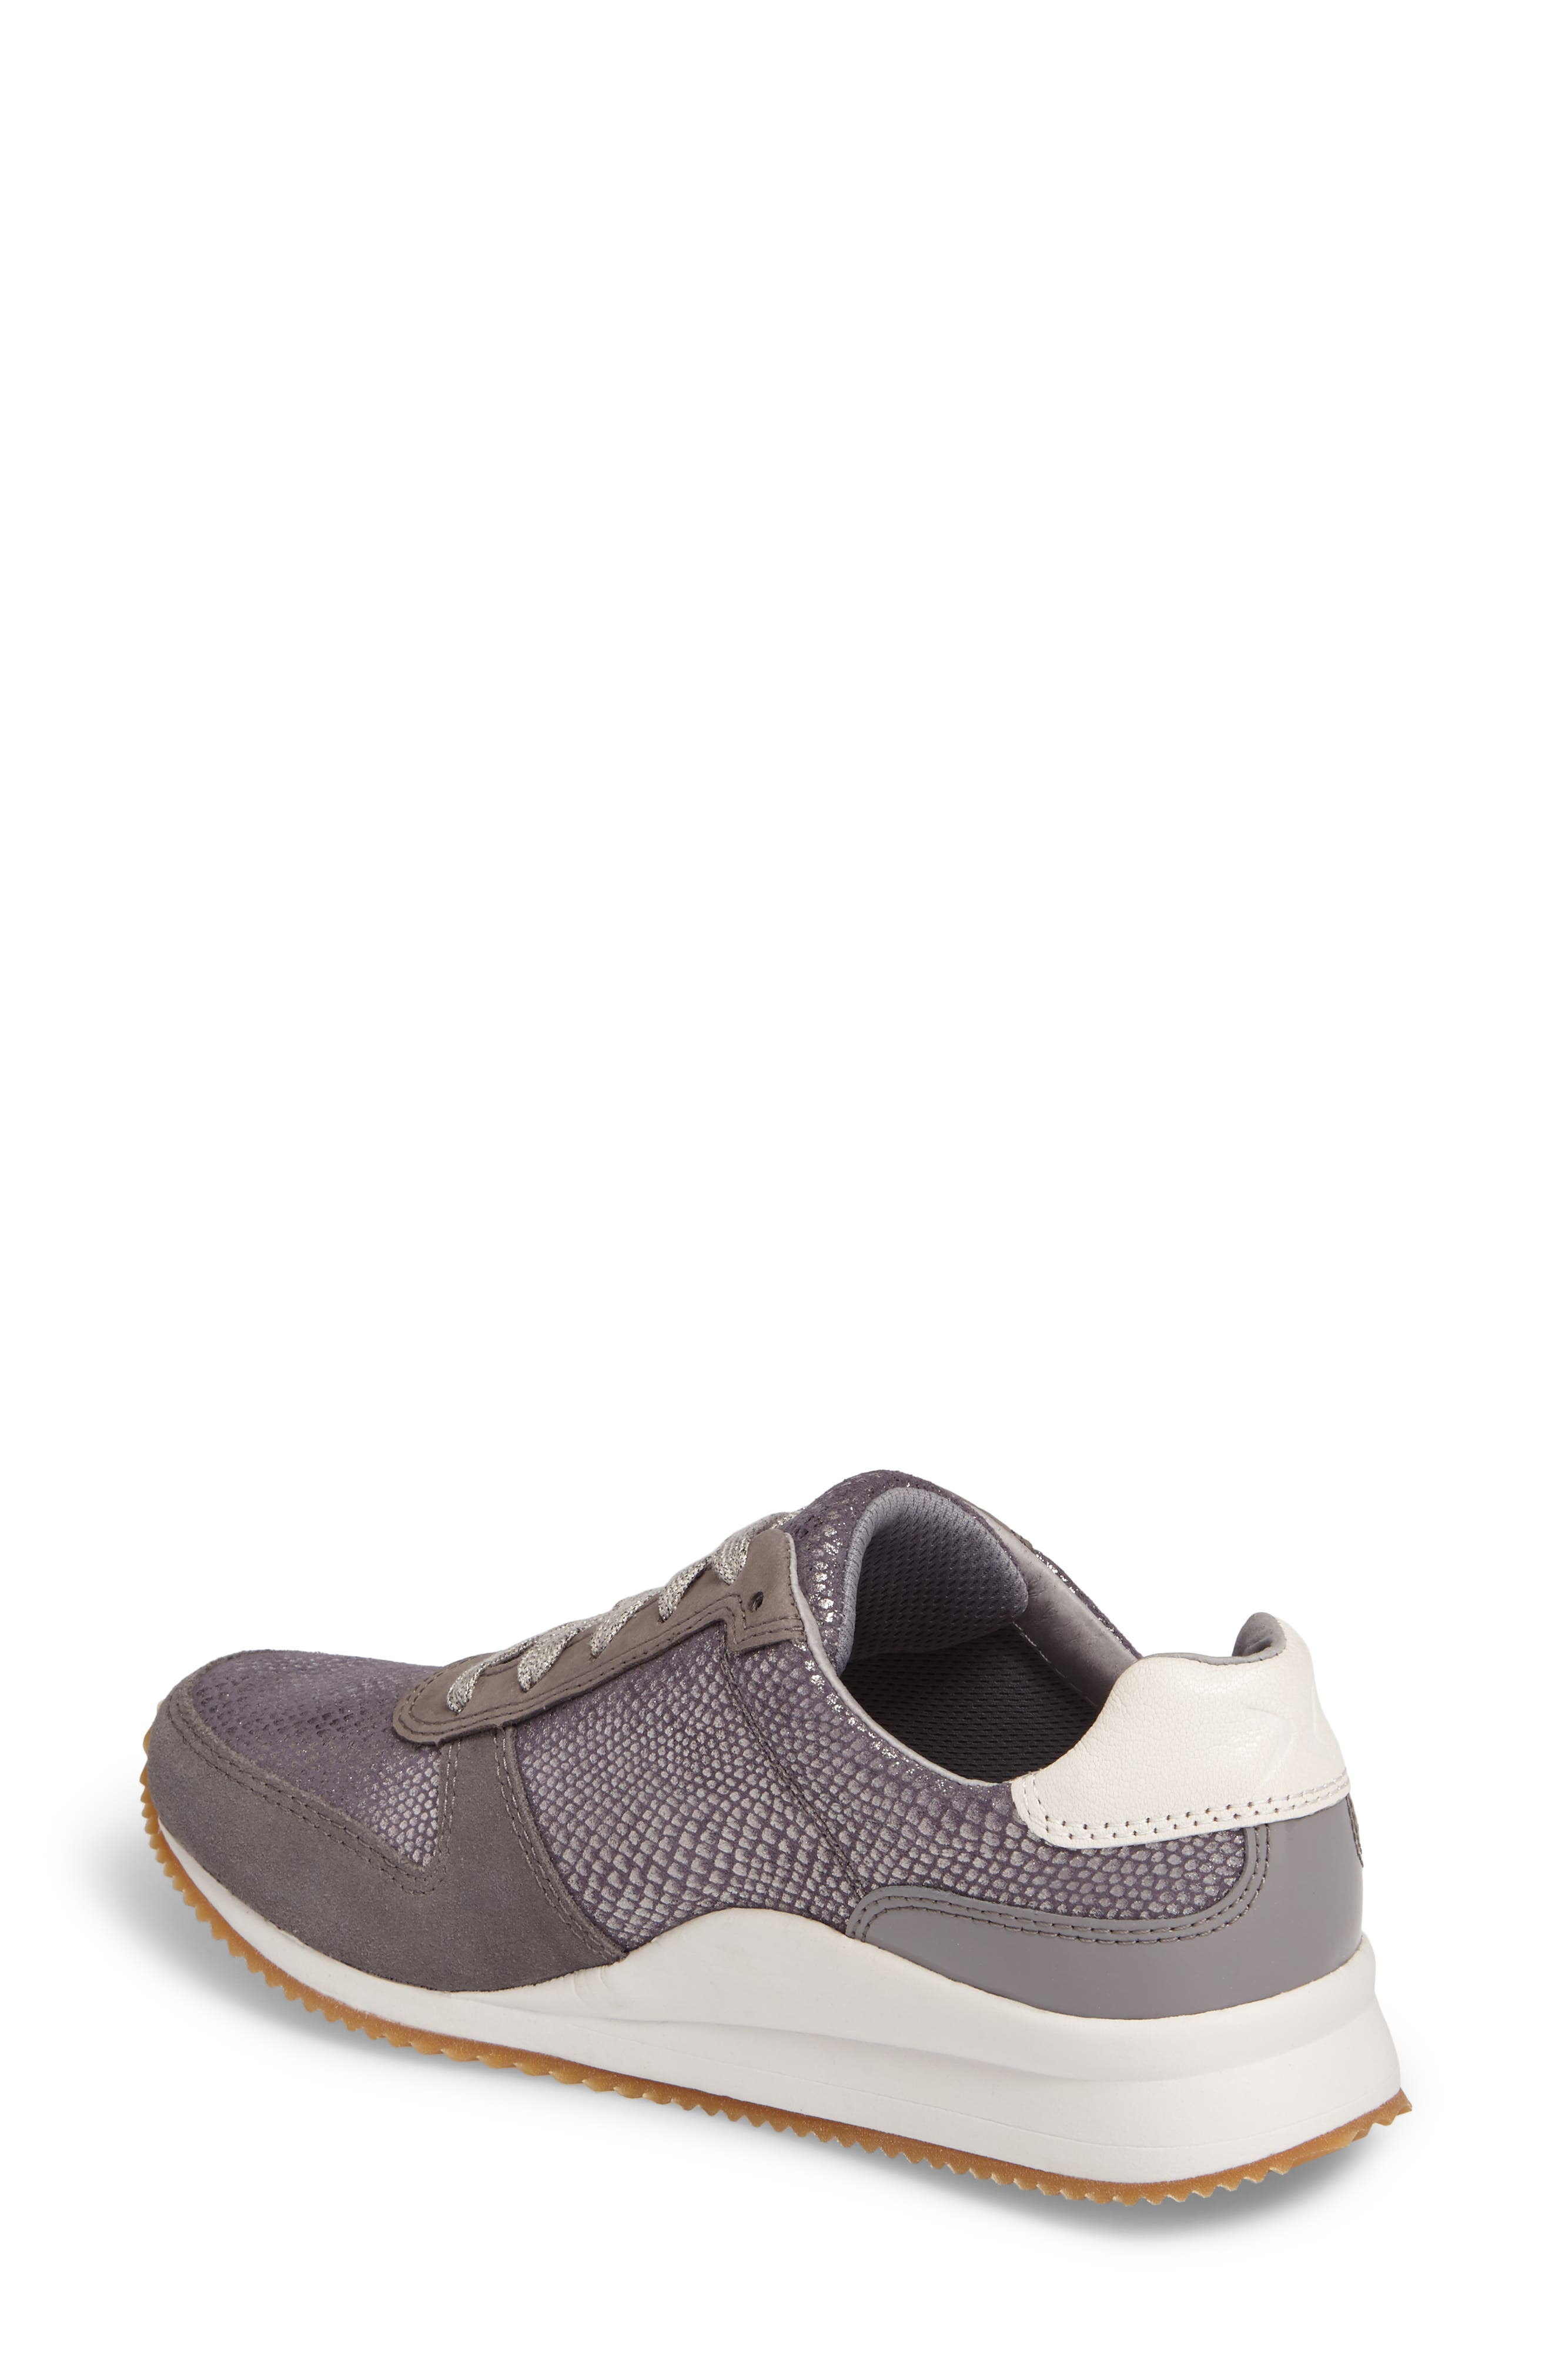 Daphne Sneaker,                             Alternate thumbnail 2, color,                             Grey Leather